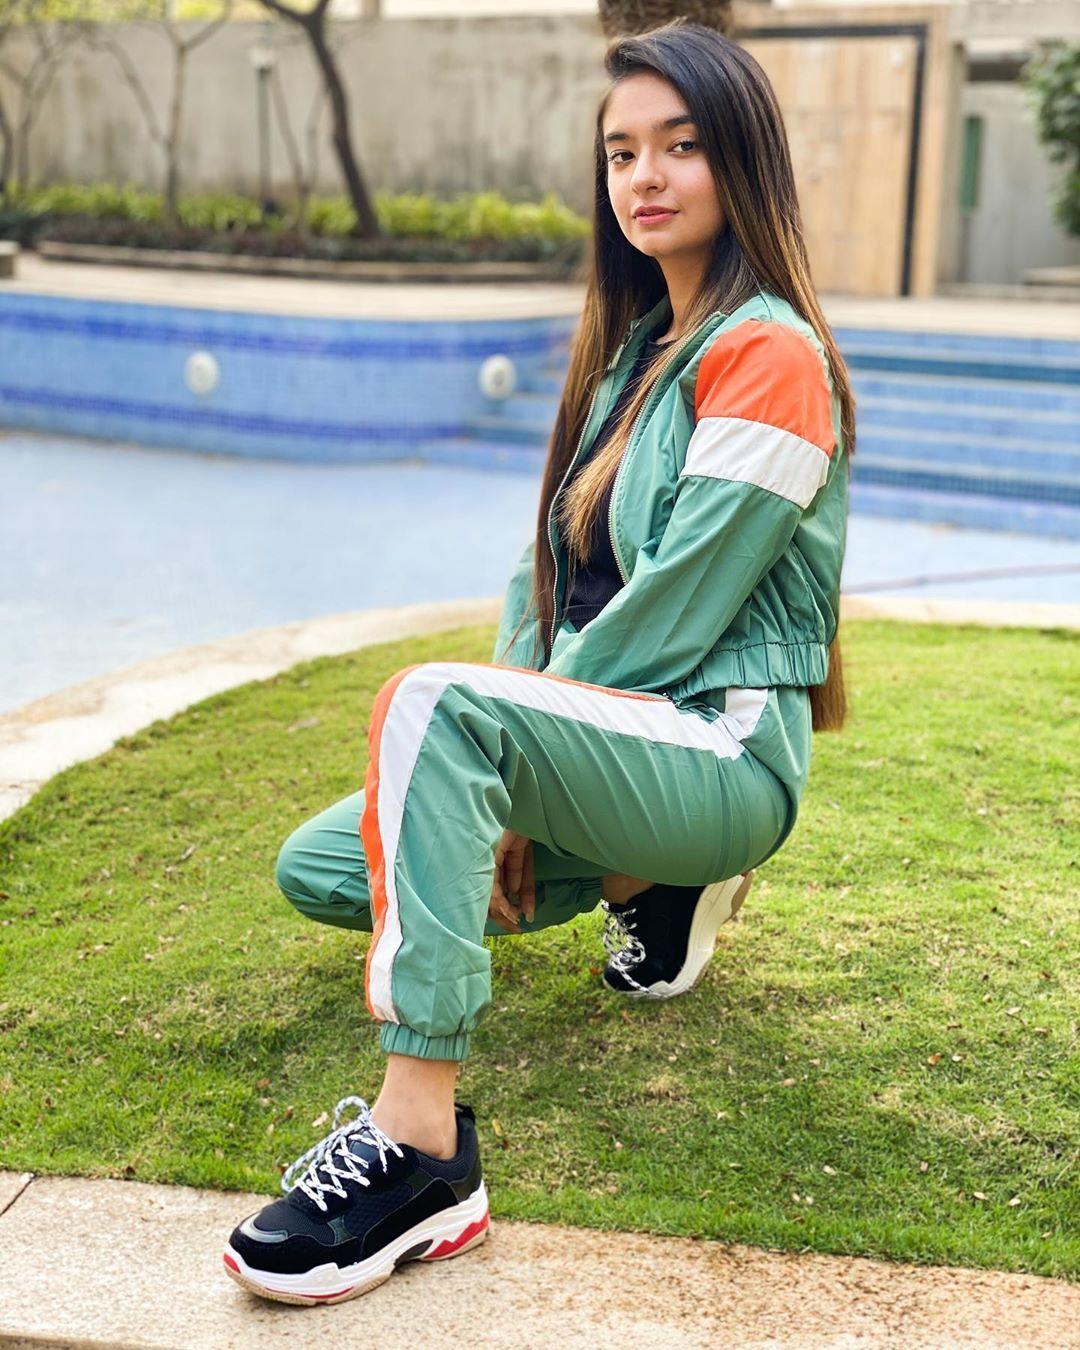 Top 50 Cute Teen Desi Girls with Big Boobs Wallpapers